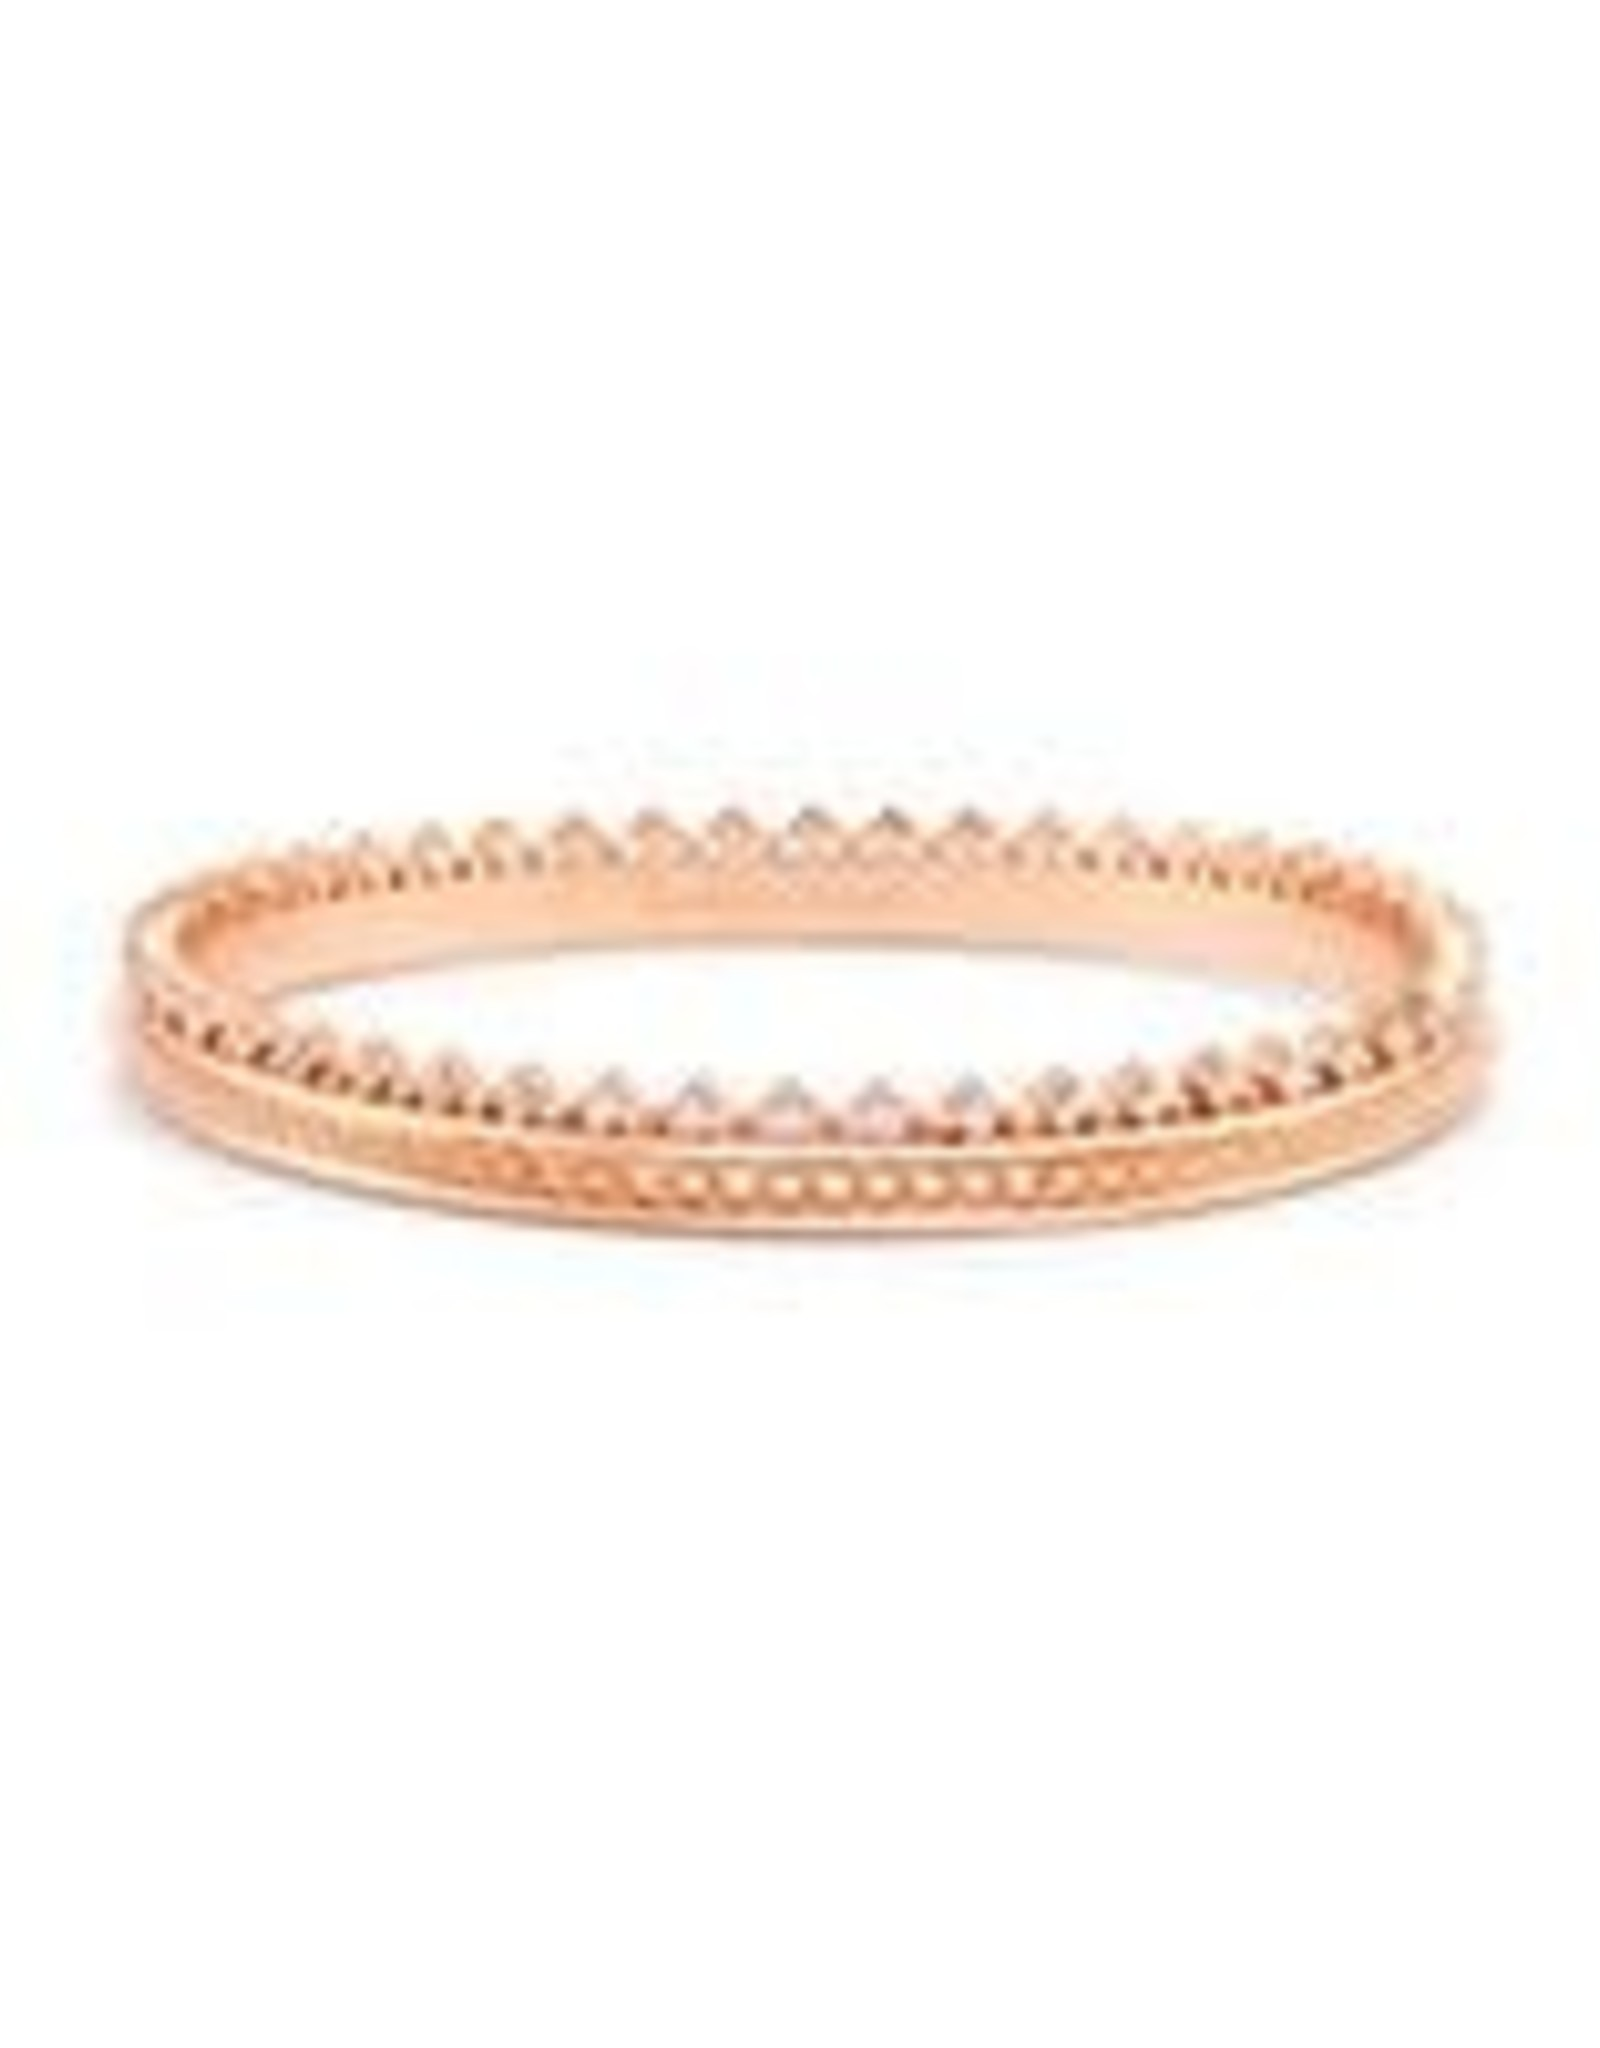 Kendra Scott KENDRA SCOTT Bracelet- MaryCaroline